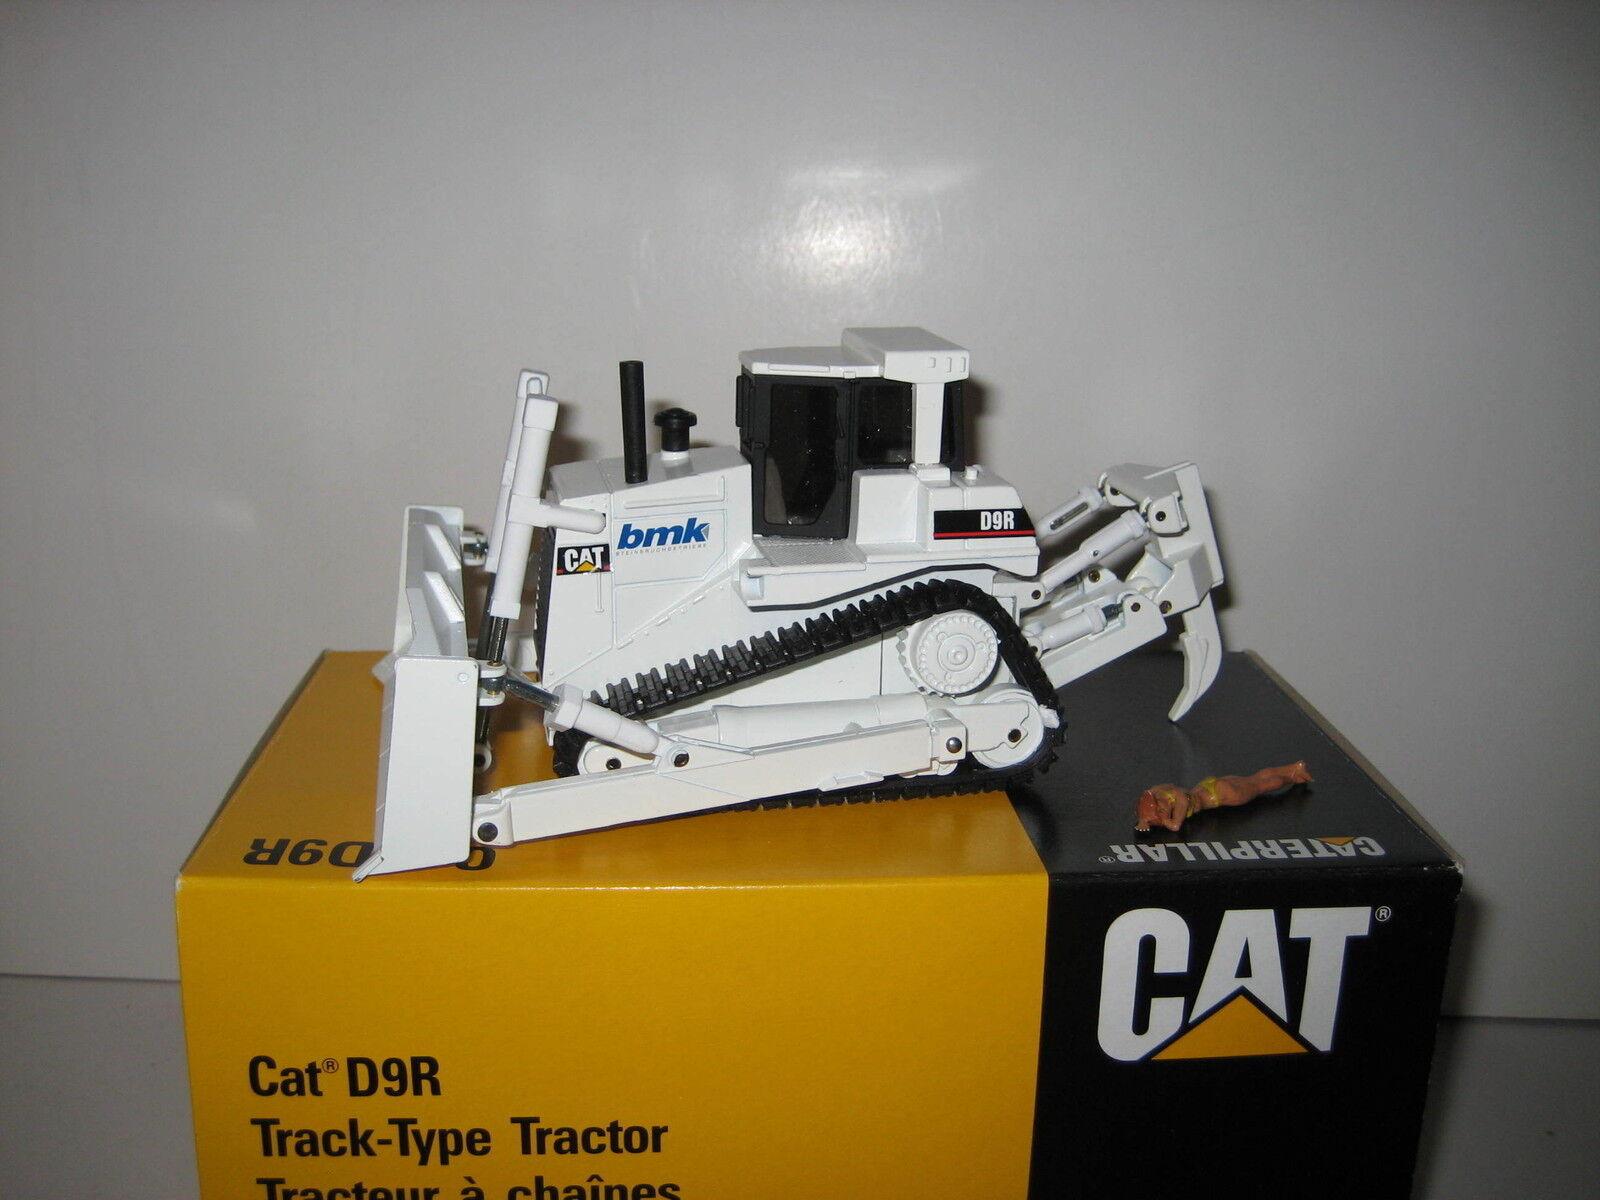 CATERPILLAR D 9 R Bouteur repere  451 NZG 1 50 neuf dans sa boîte